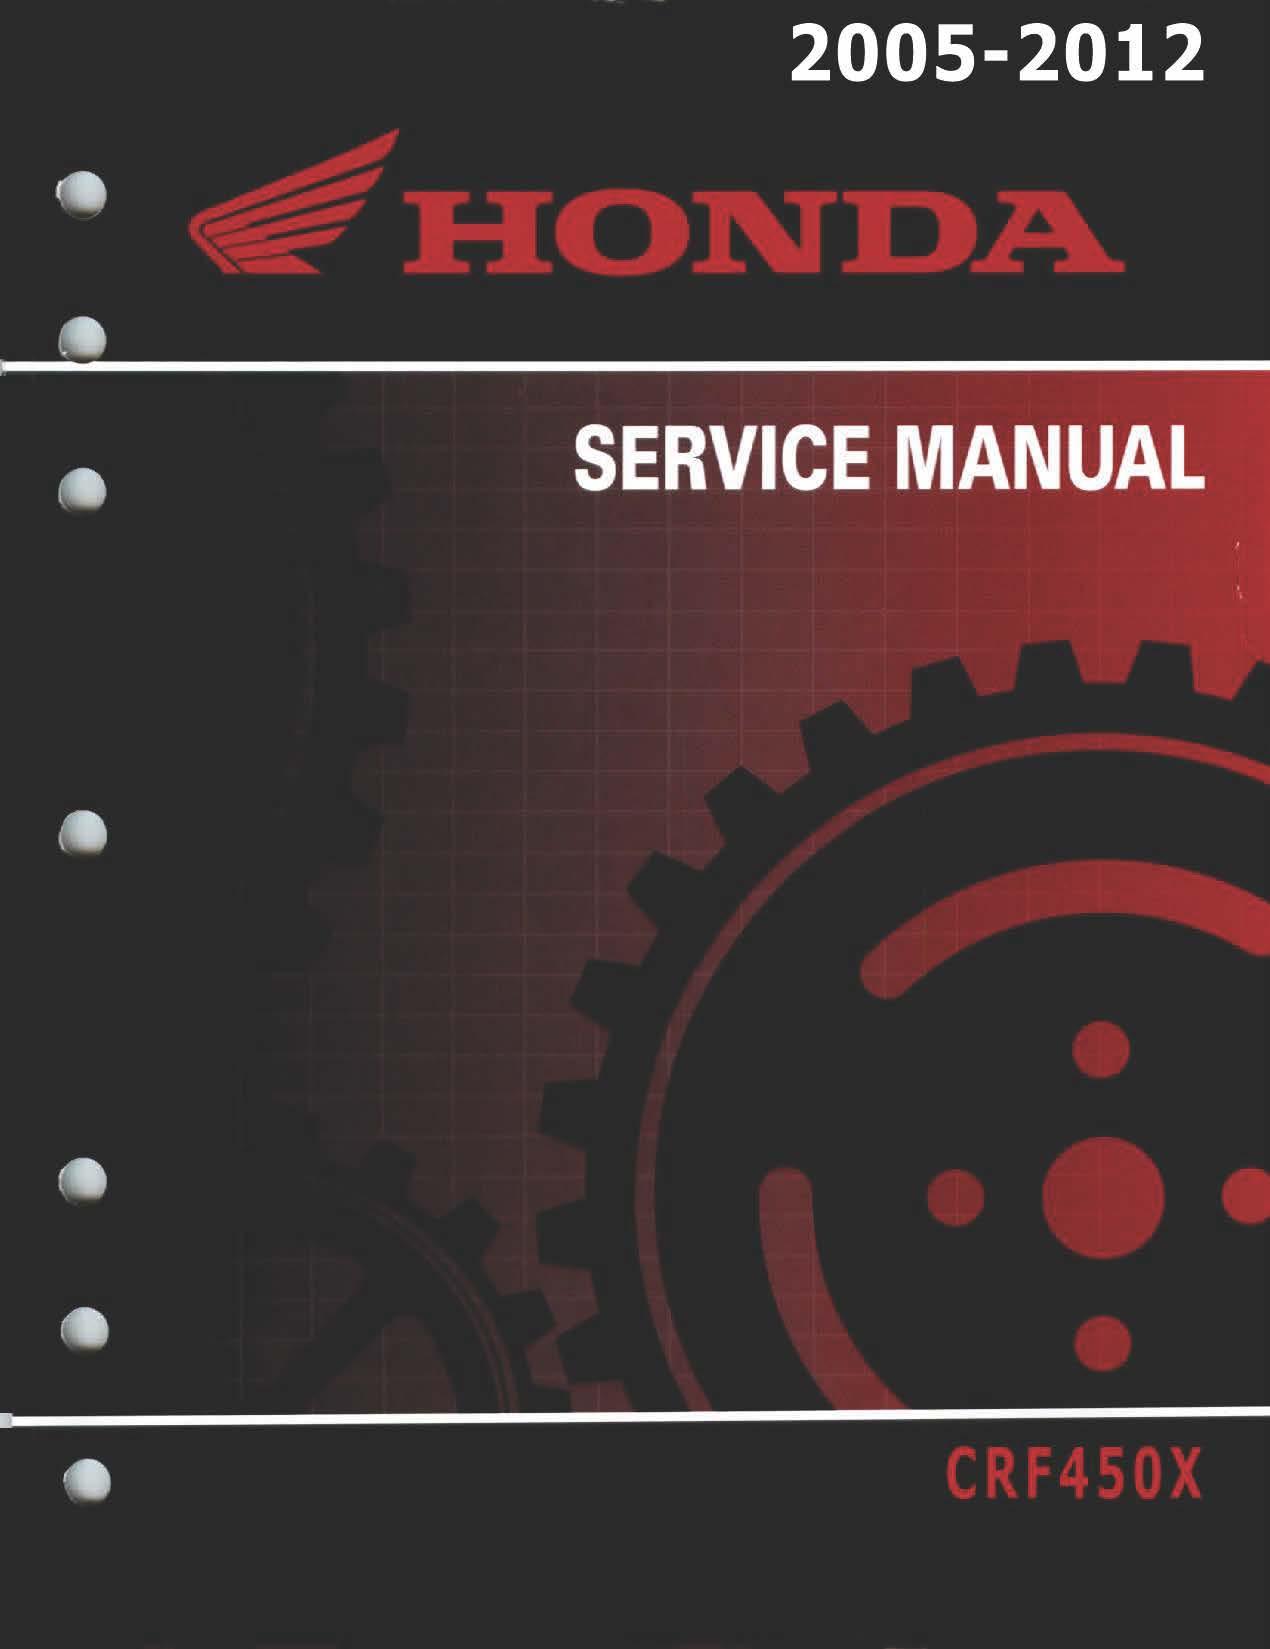 Workshop manual for Honda CRF450X (2005-2012)